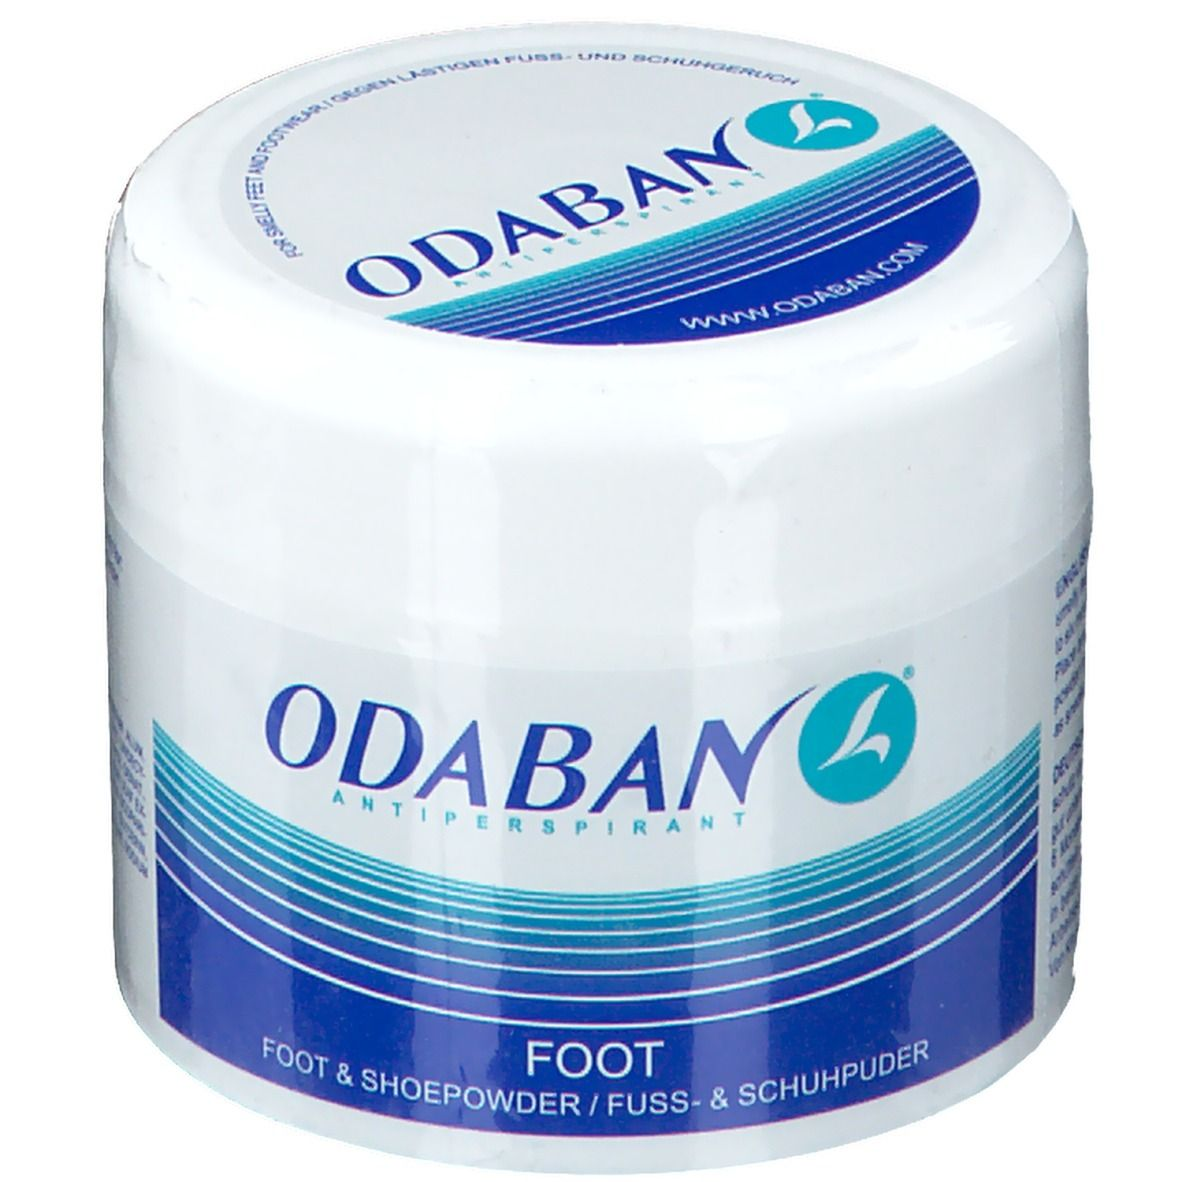 Image of ODABAN® Fuß- und Schuhpuder